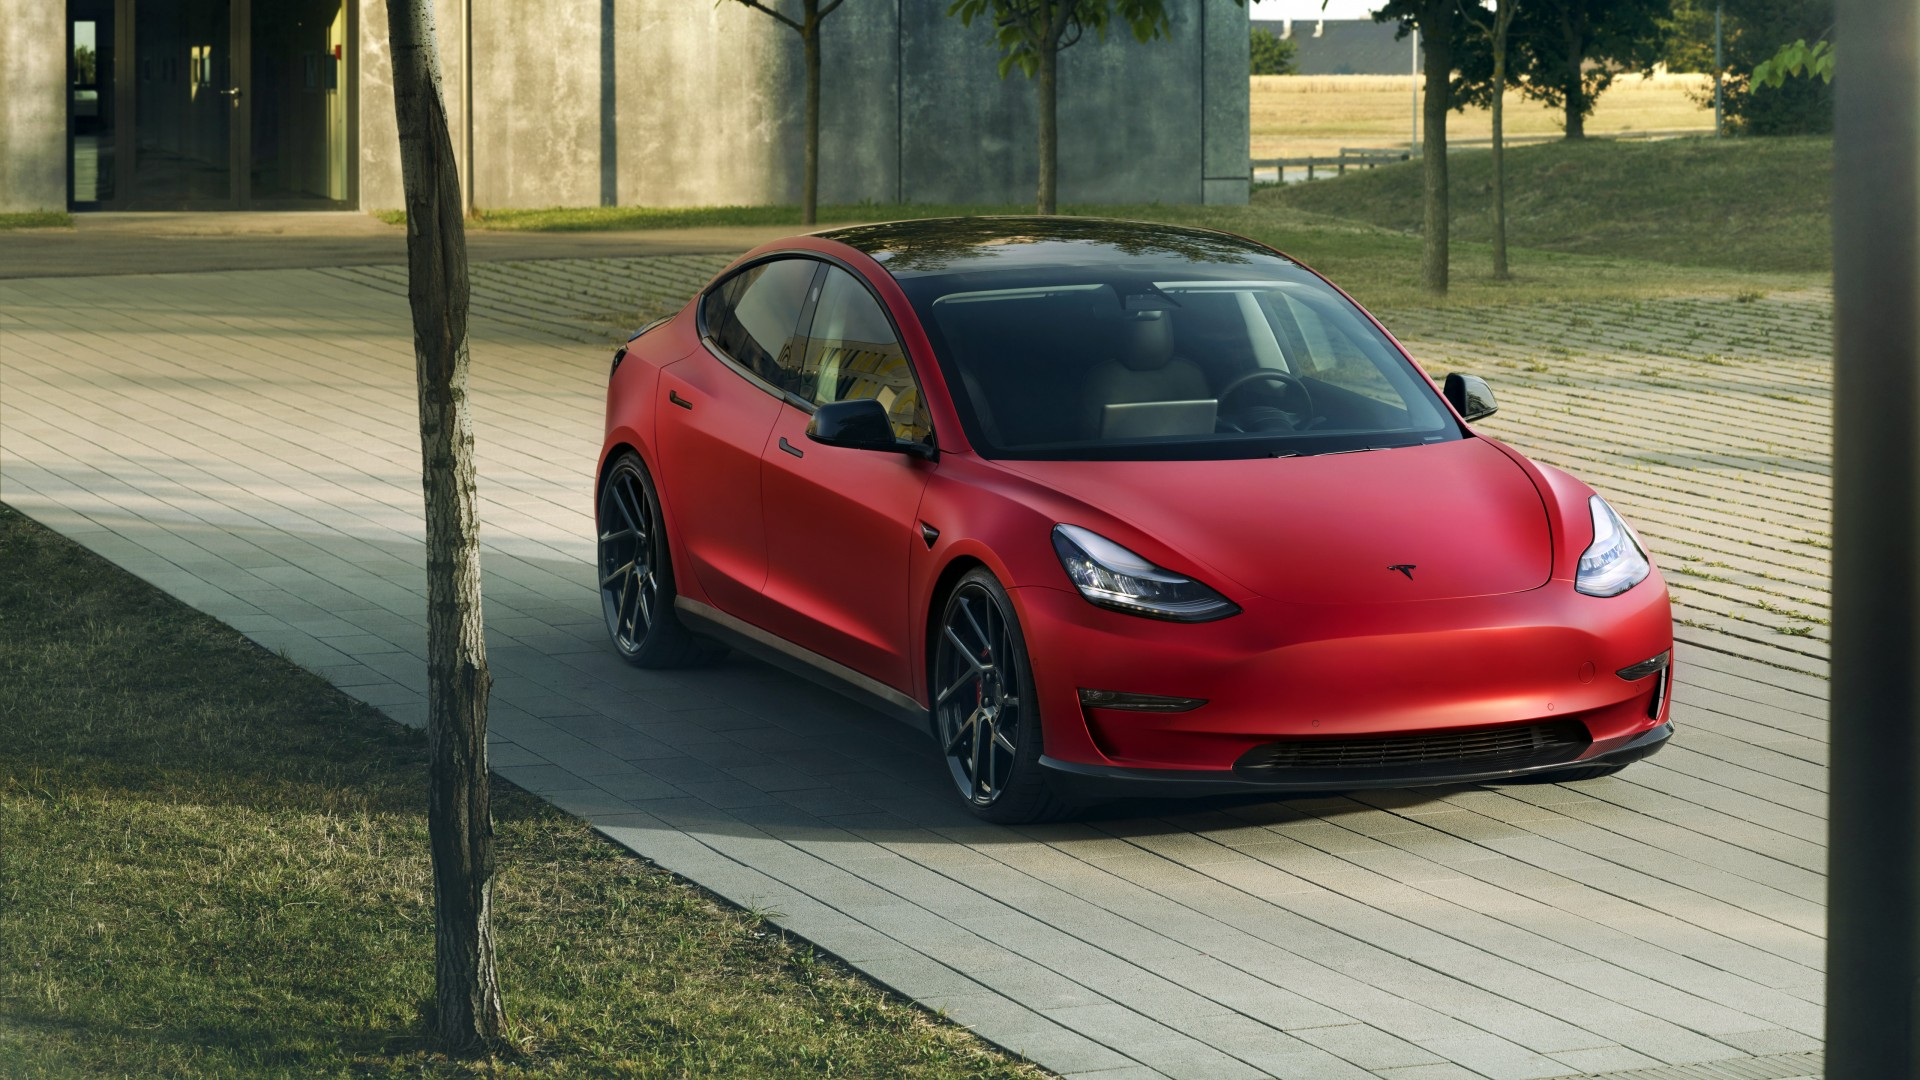 Novitec Tesla Model 3 2019 4K 2 Wallpaper | HD Car ...